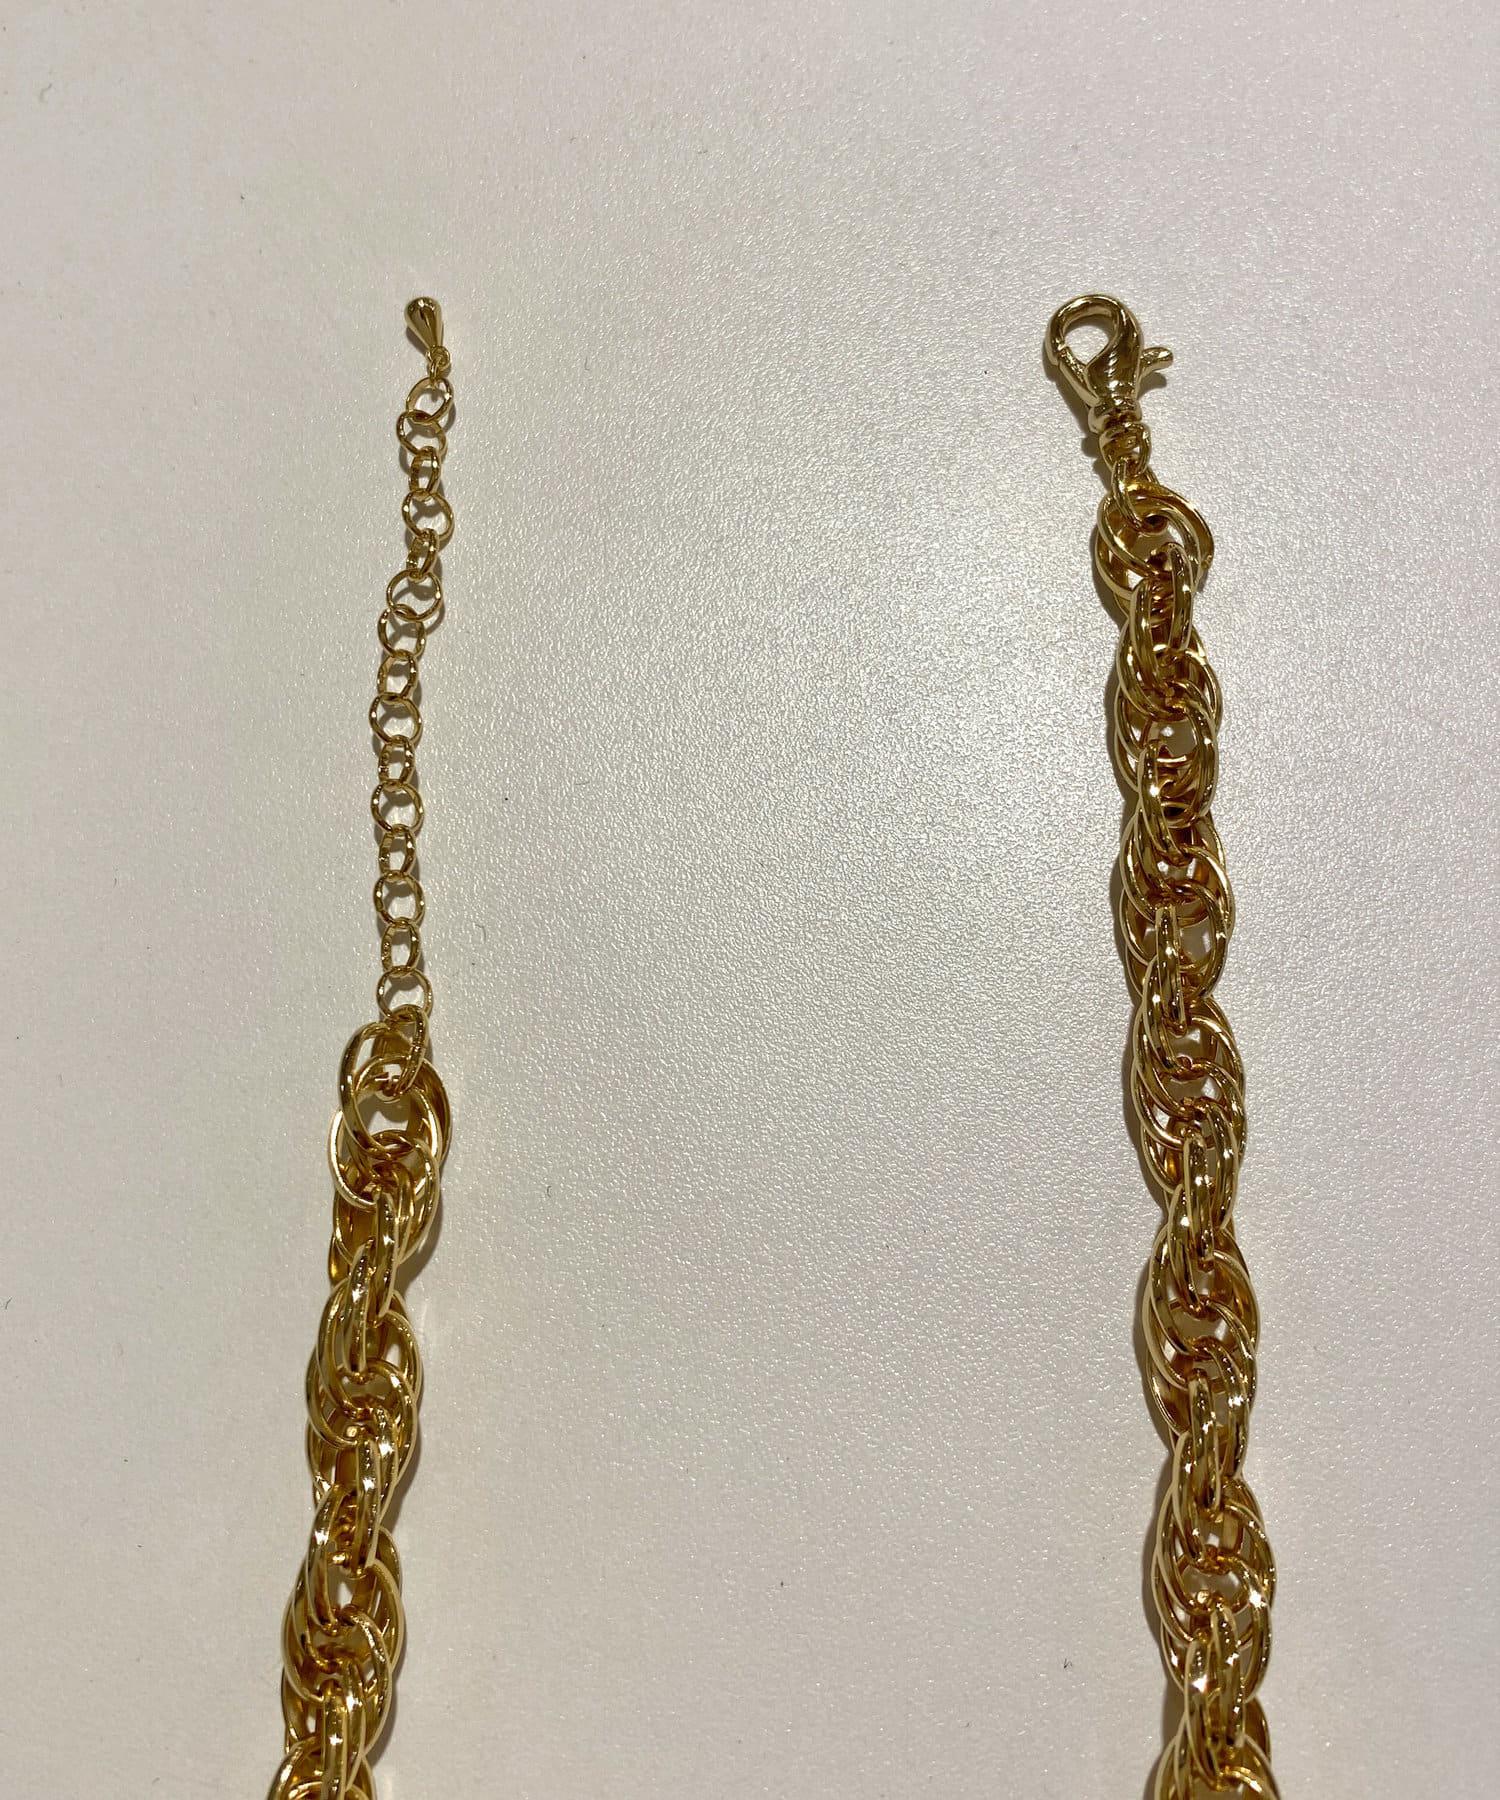 Omekashi(オメカシ) ロープチェーンネックレス